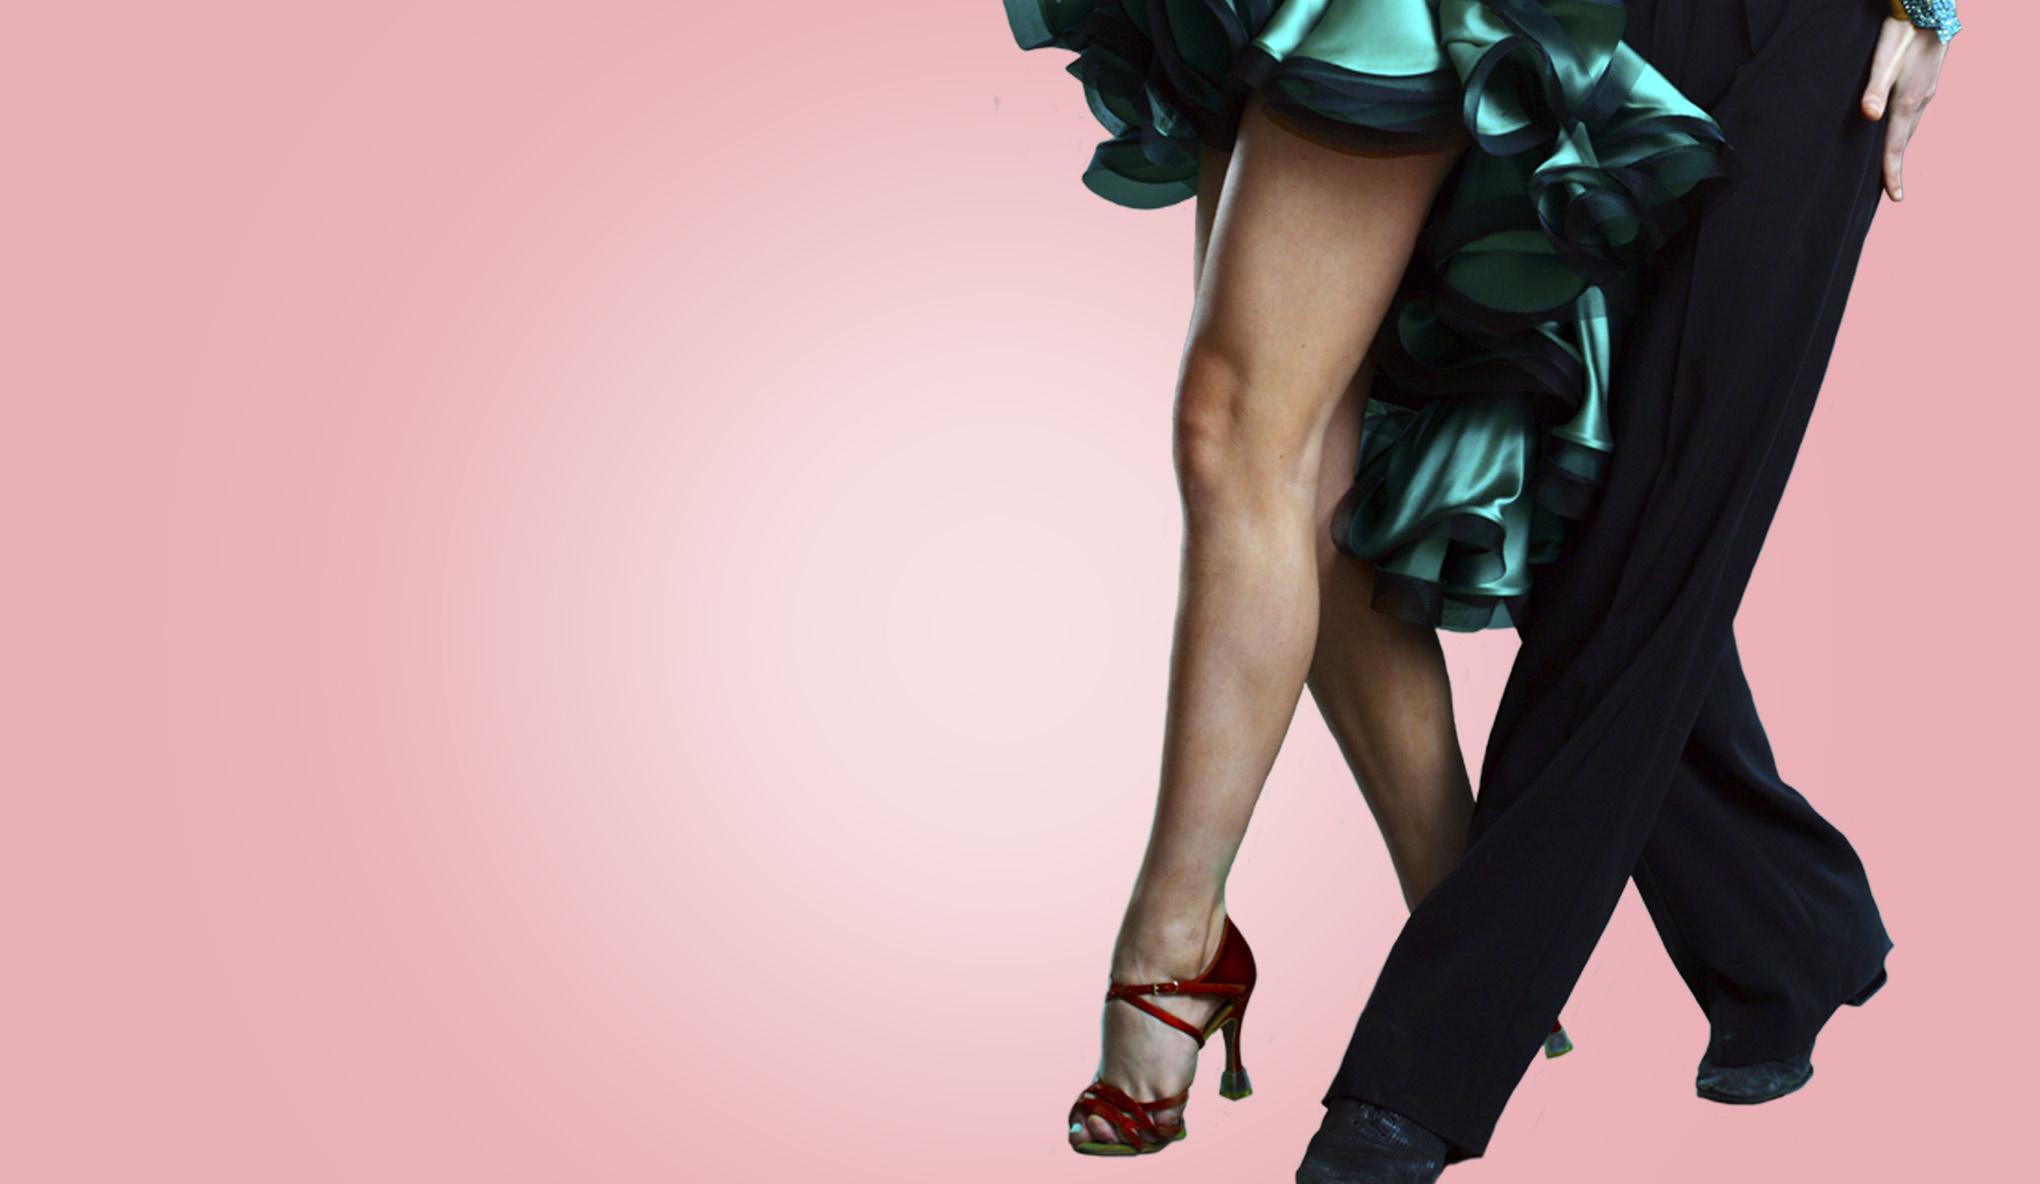 Muge_ballroom_shoe.jpg